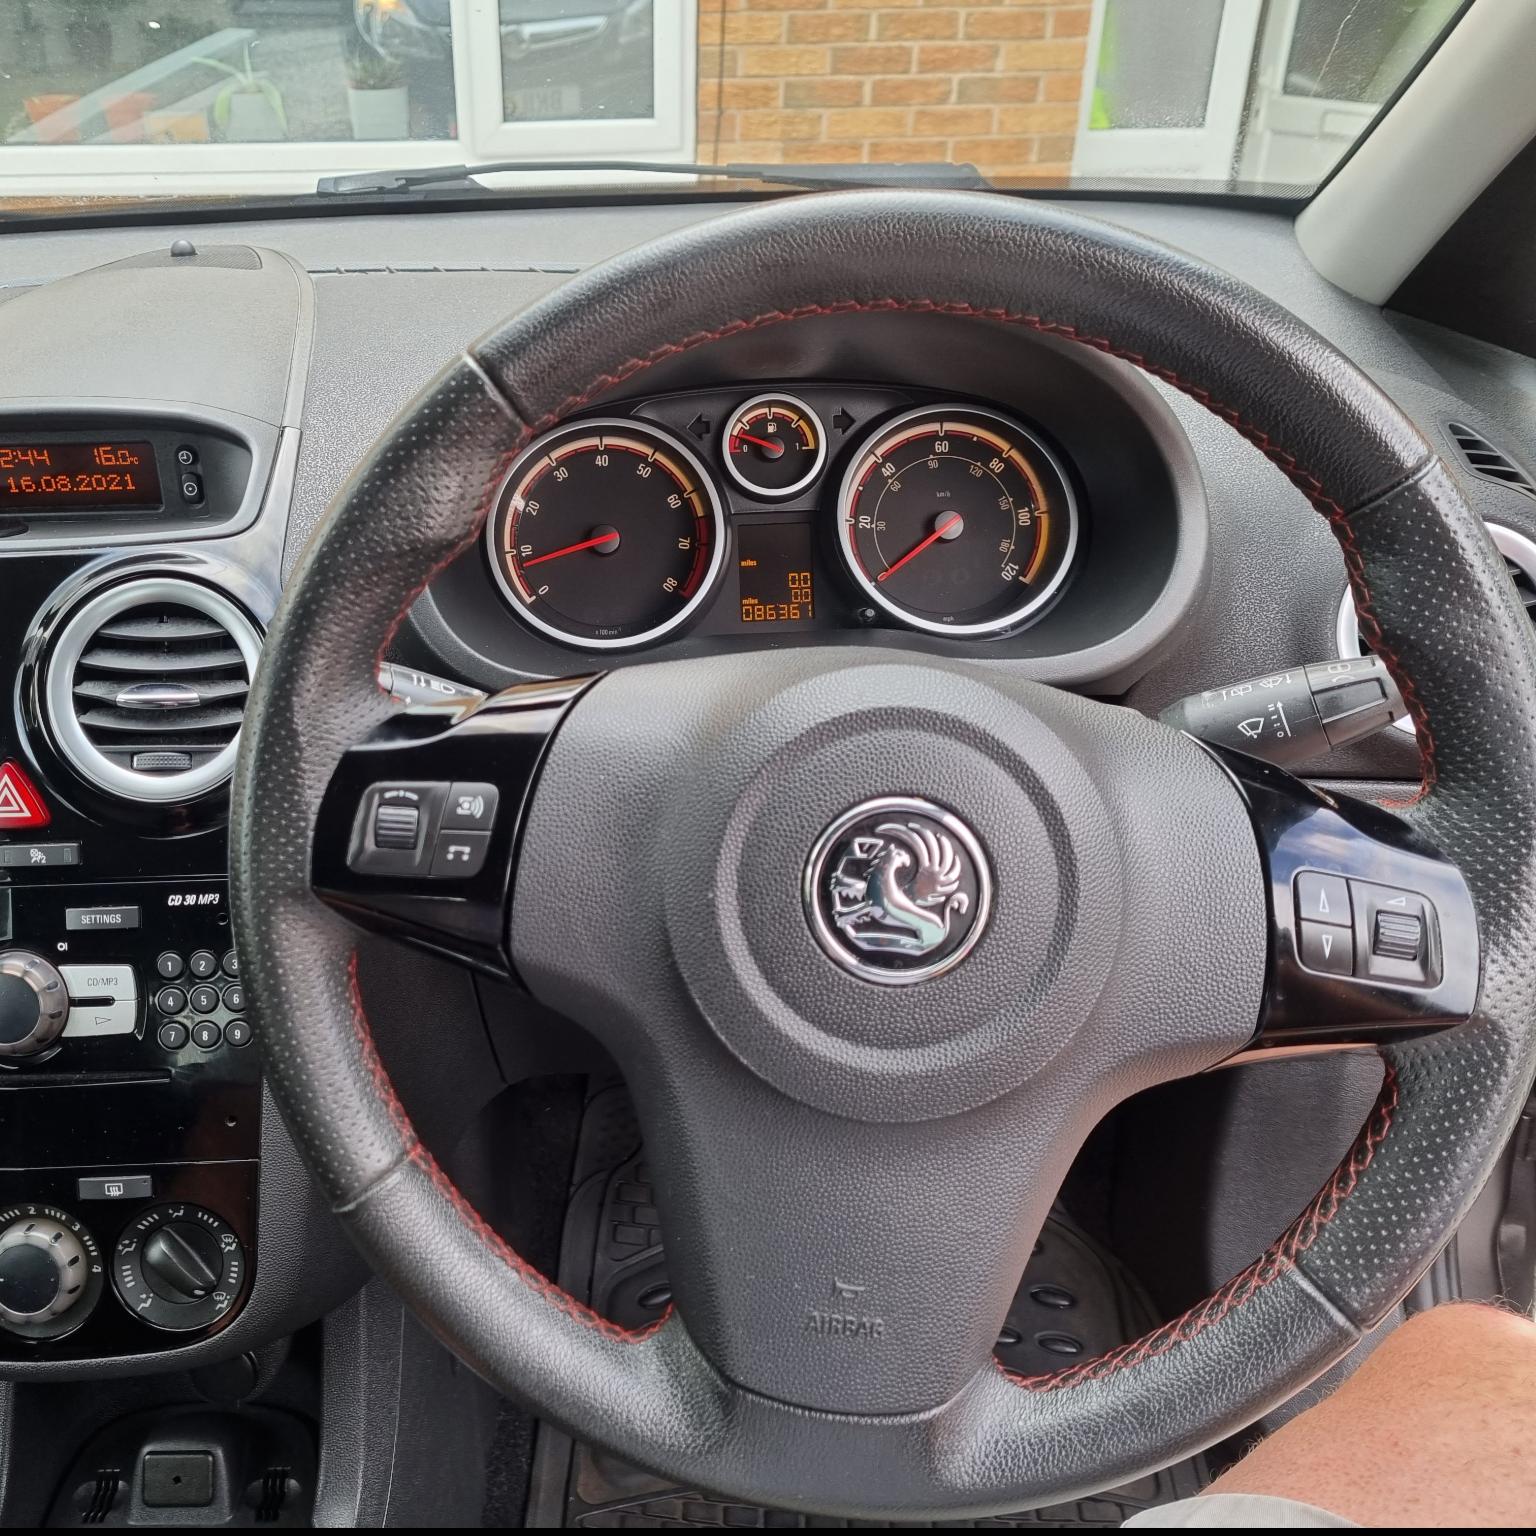 2011 VAUXHALL CORSA SXI AC 1398cc PETROL MANUAL 5 Speed 5 DOOR HATCHBACK